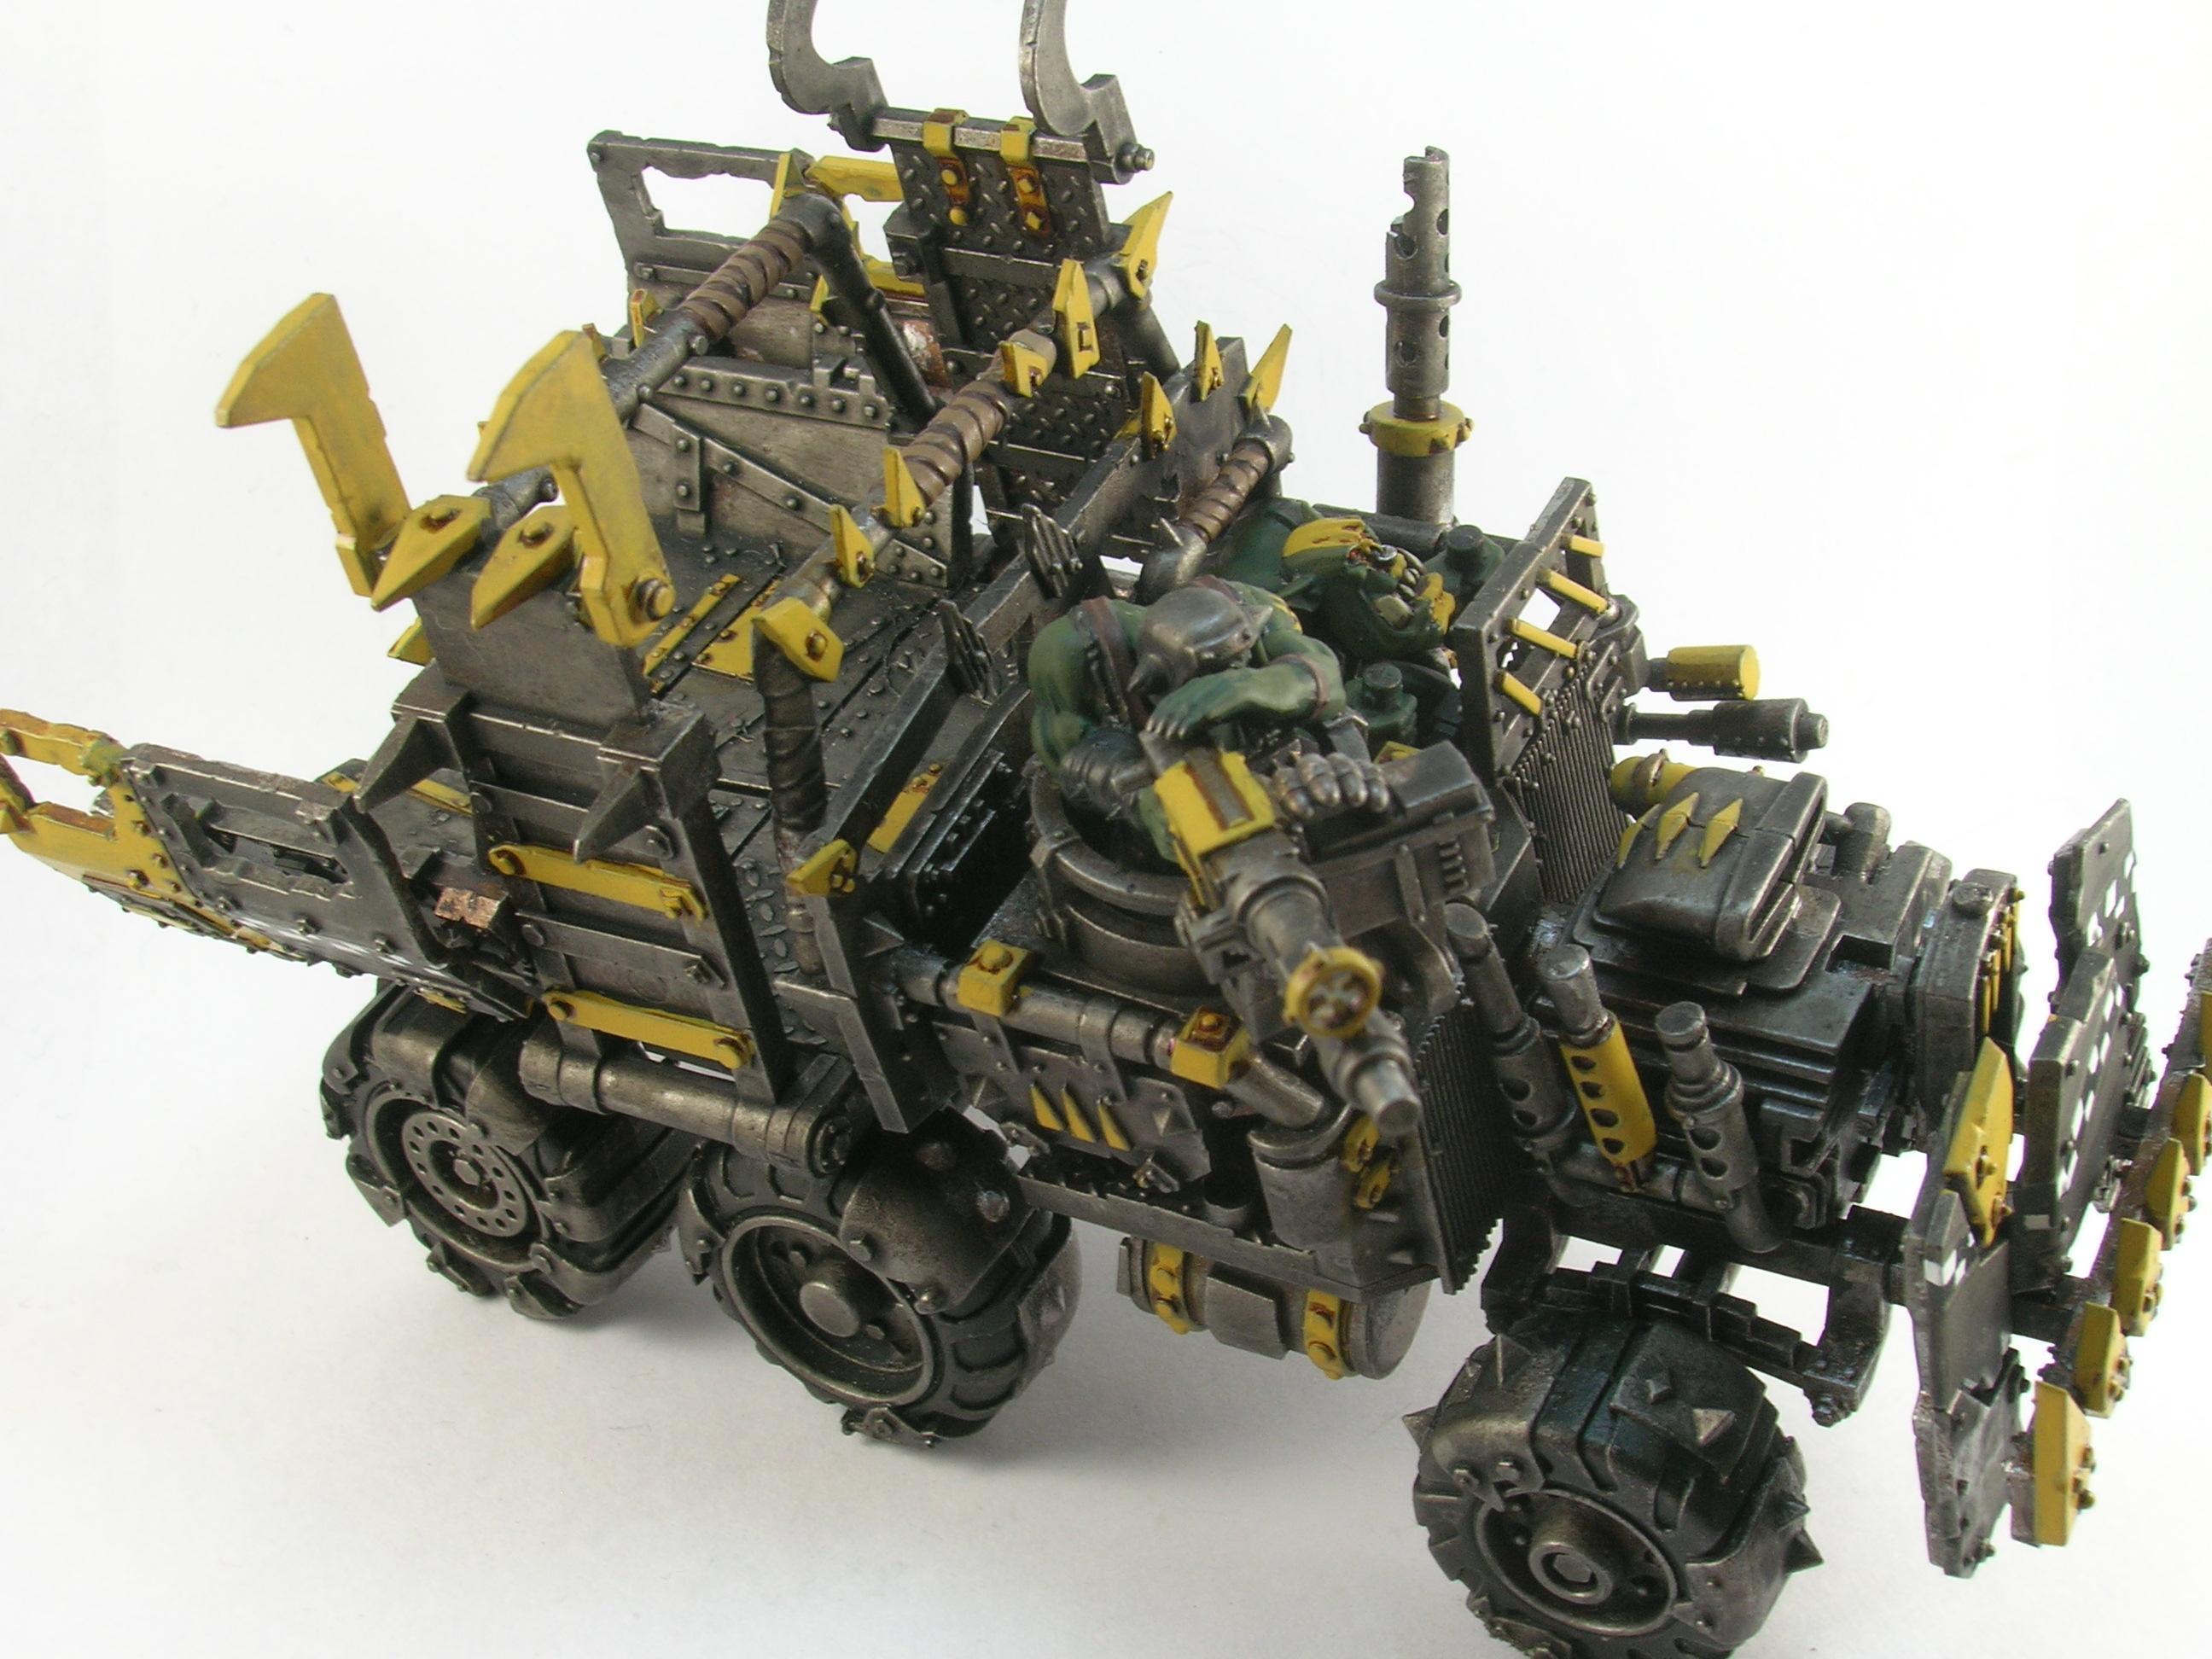 Bad Moons, Orks, Trukk, Warhammer 40,000